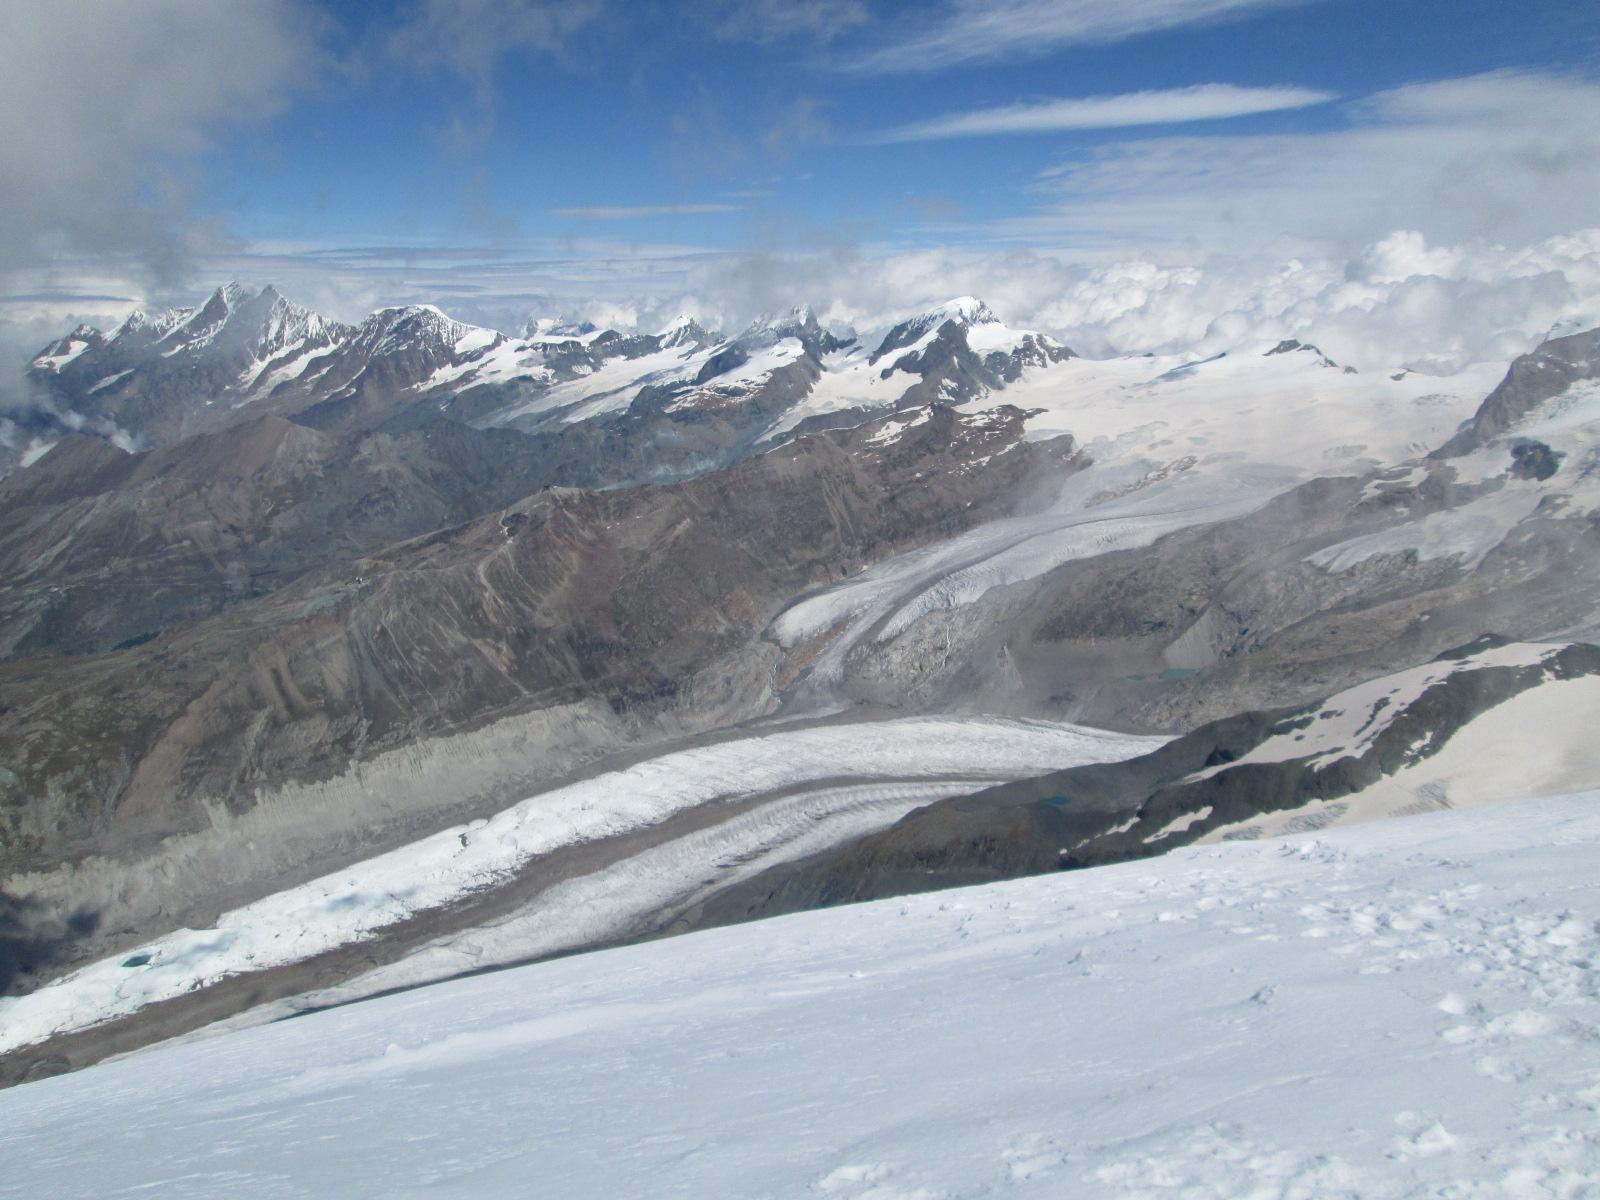 panorama sul lato Svizzero